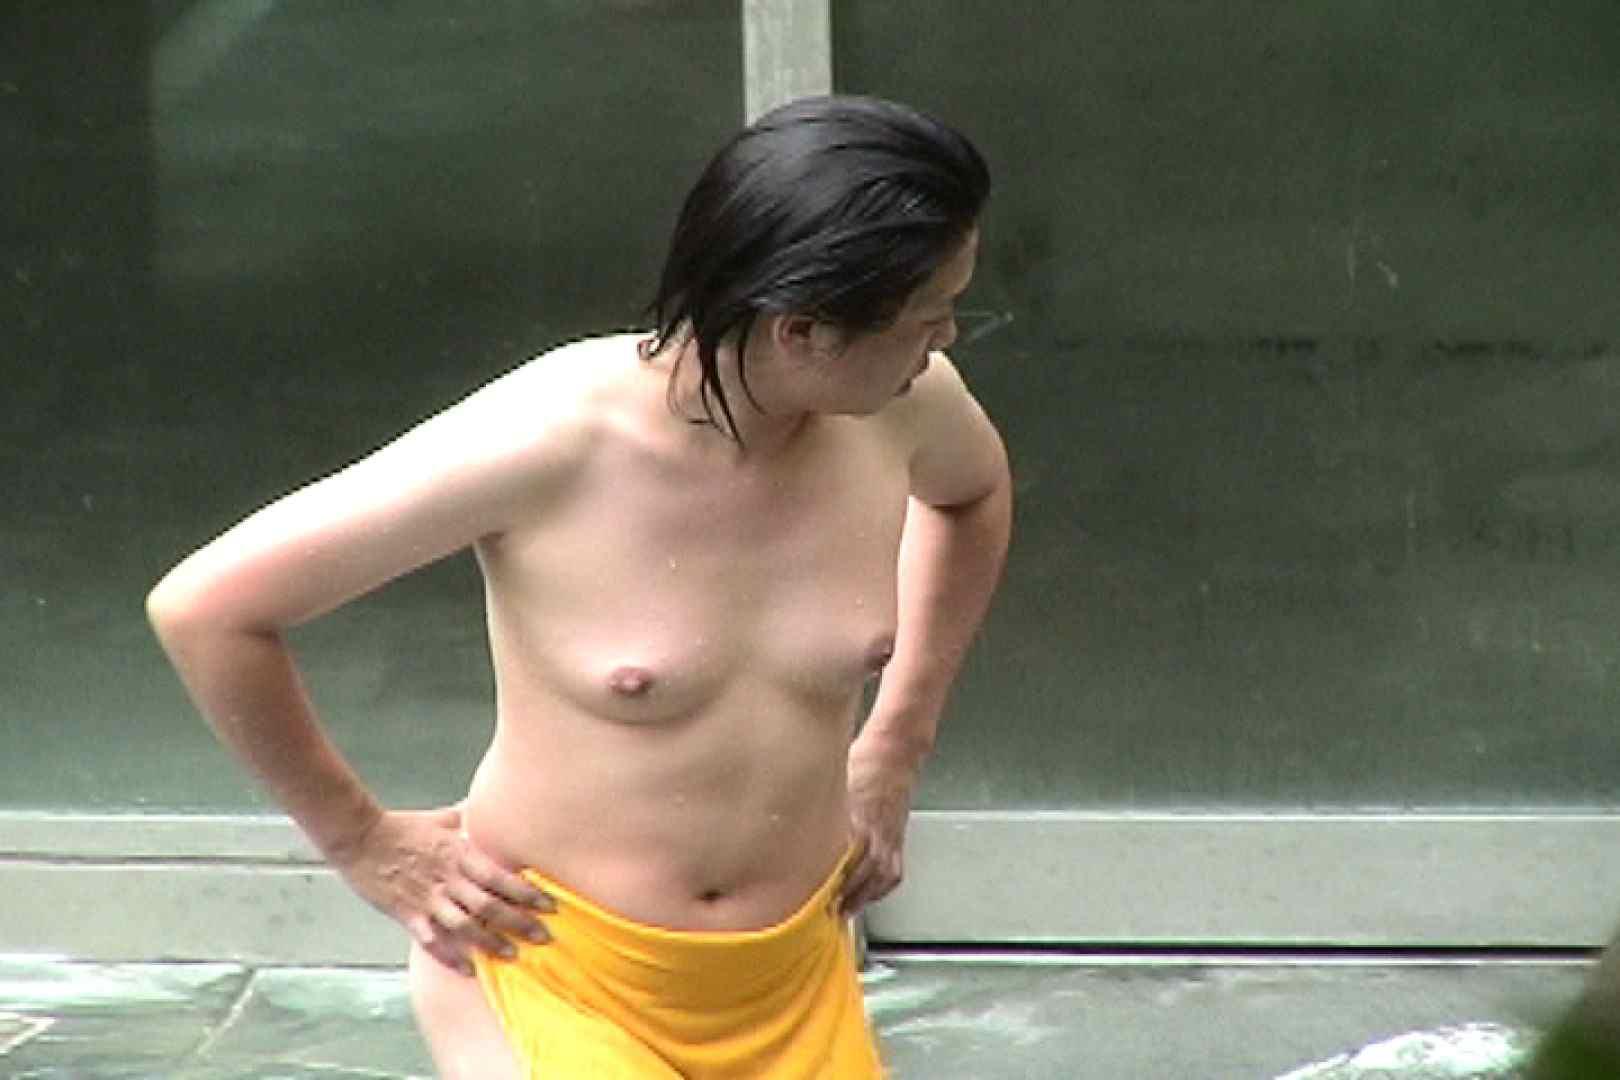 Aquaな露天風呂Vol.453 露天風呂 濡れ場動画紹介 25連発 20